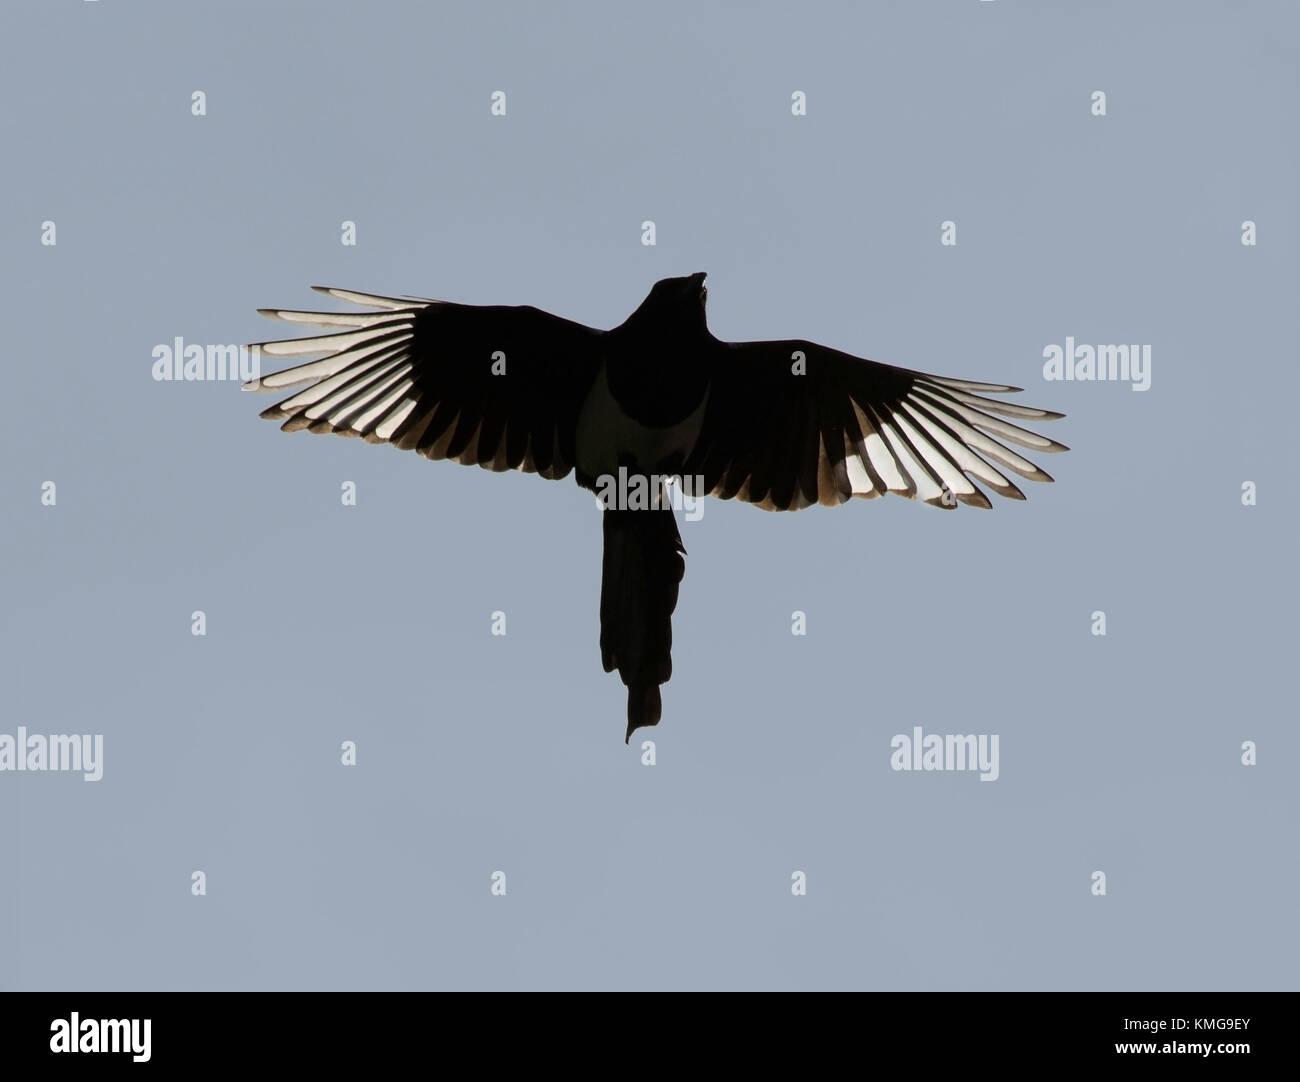 Elster, Pica Pica, im Flug gegen Plain blue sky, Lancashire, Großbritannien Stockbild